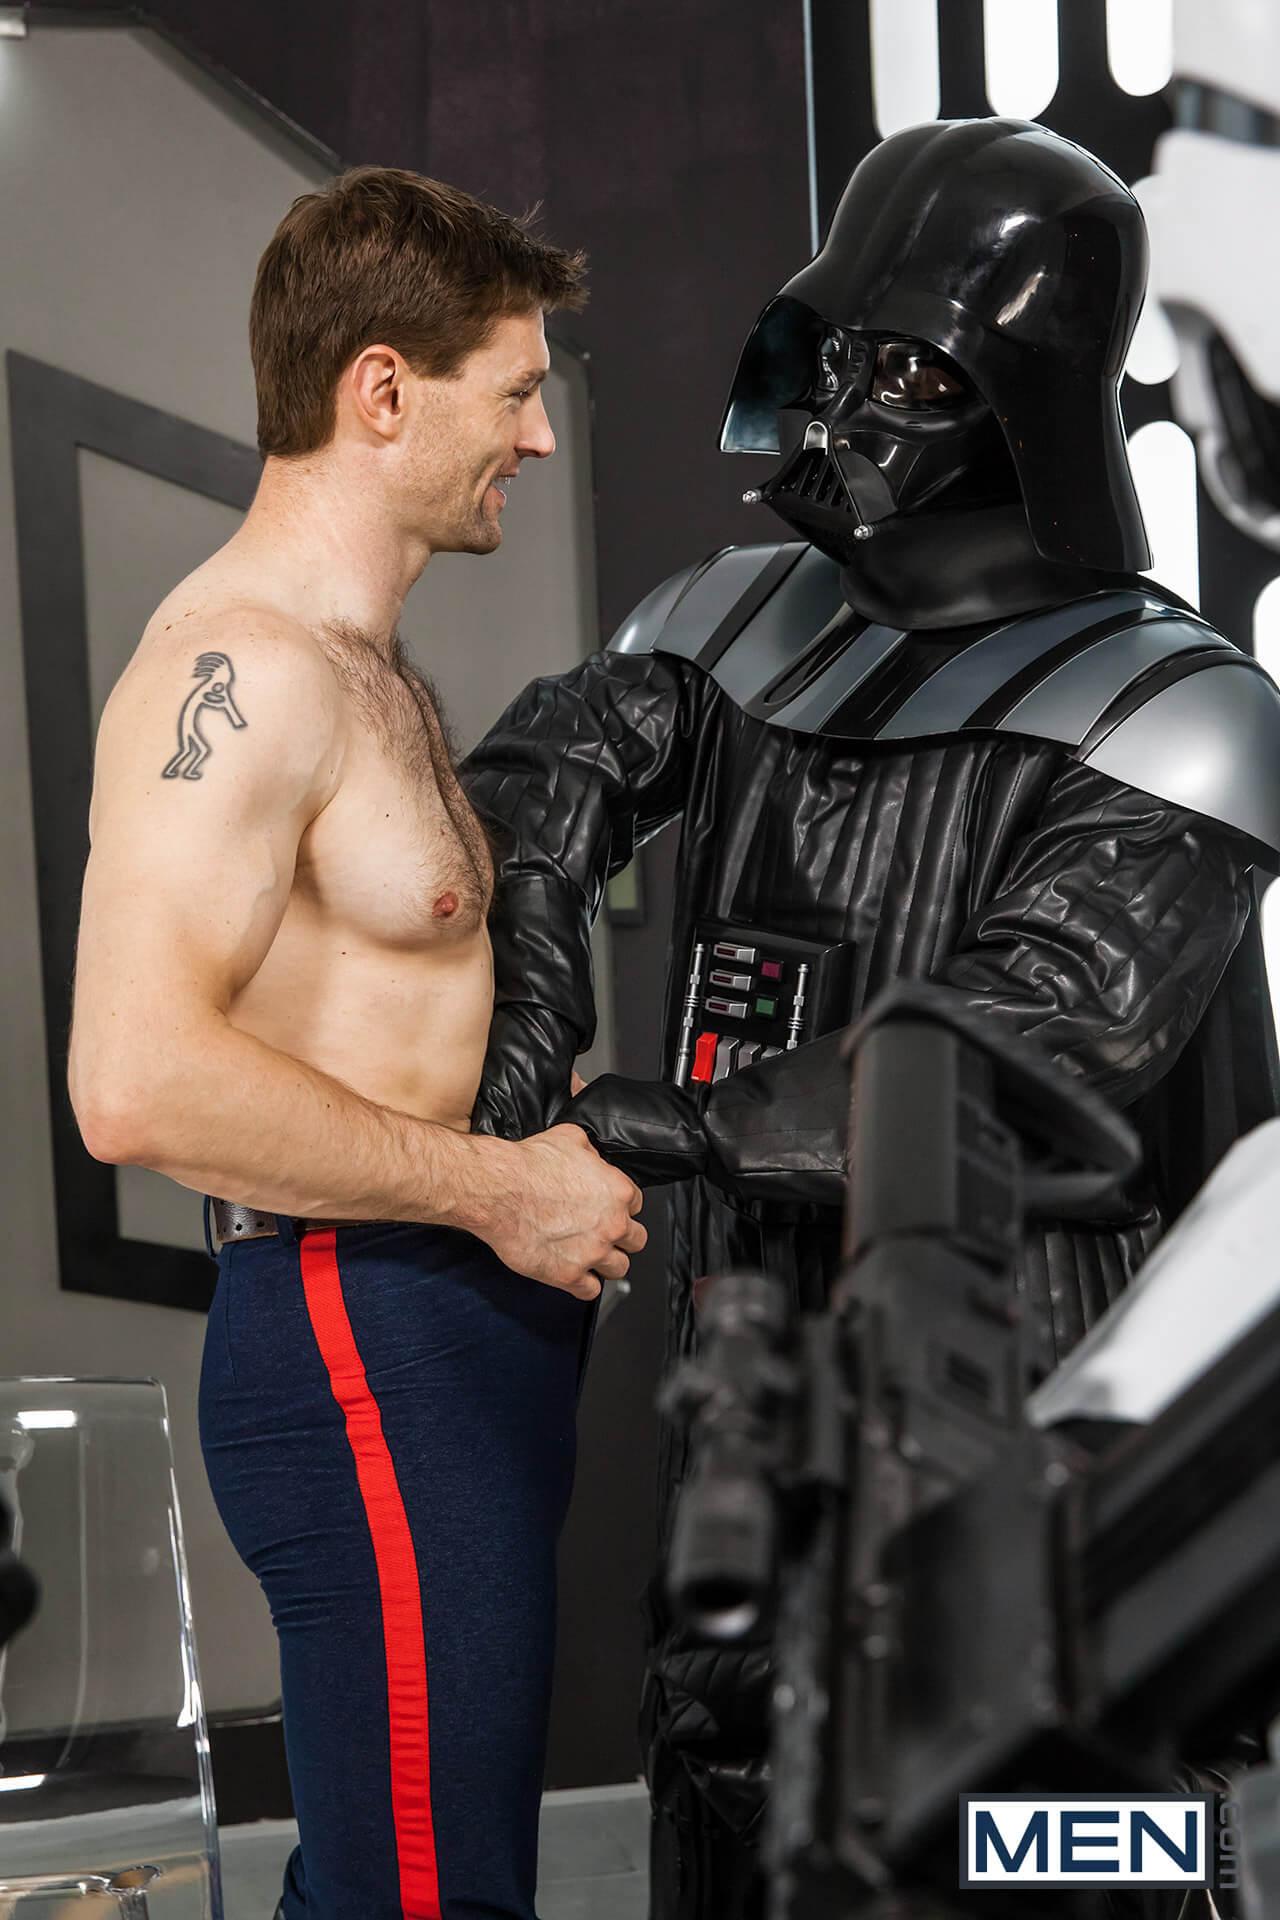 Men Drill Hole Star Wars A Gay Parody Dennis West Vader Gay Porn Blog Image